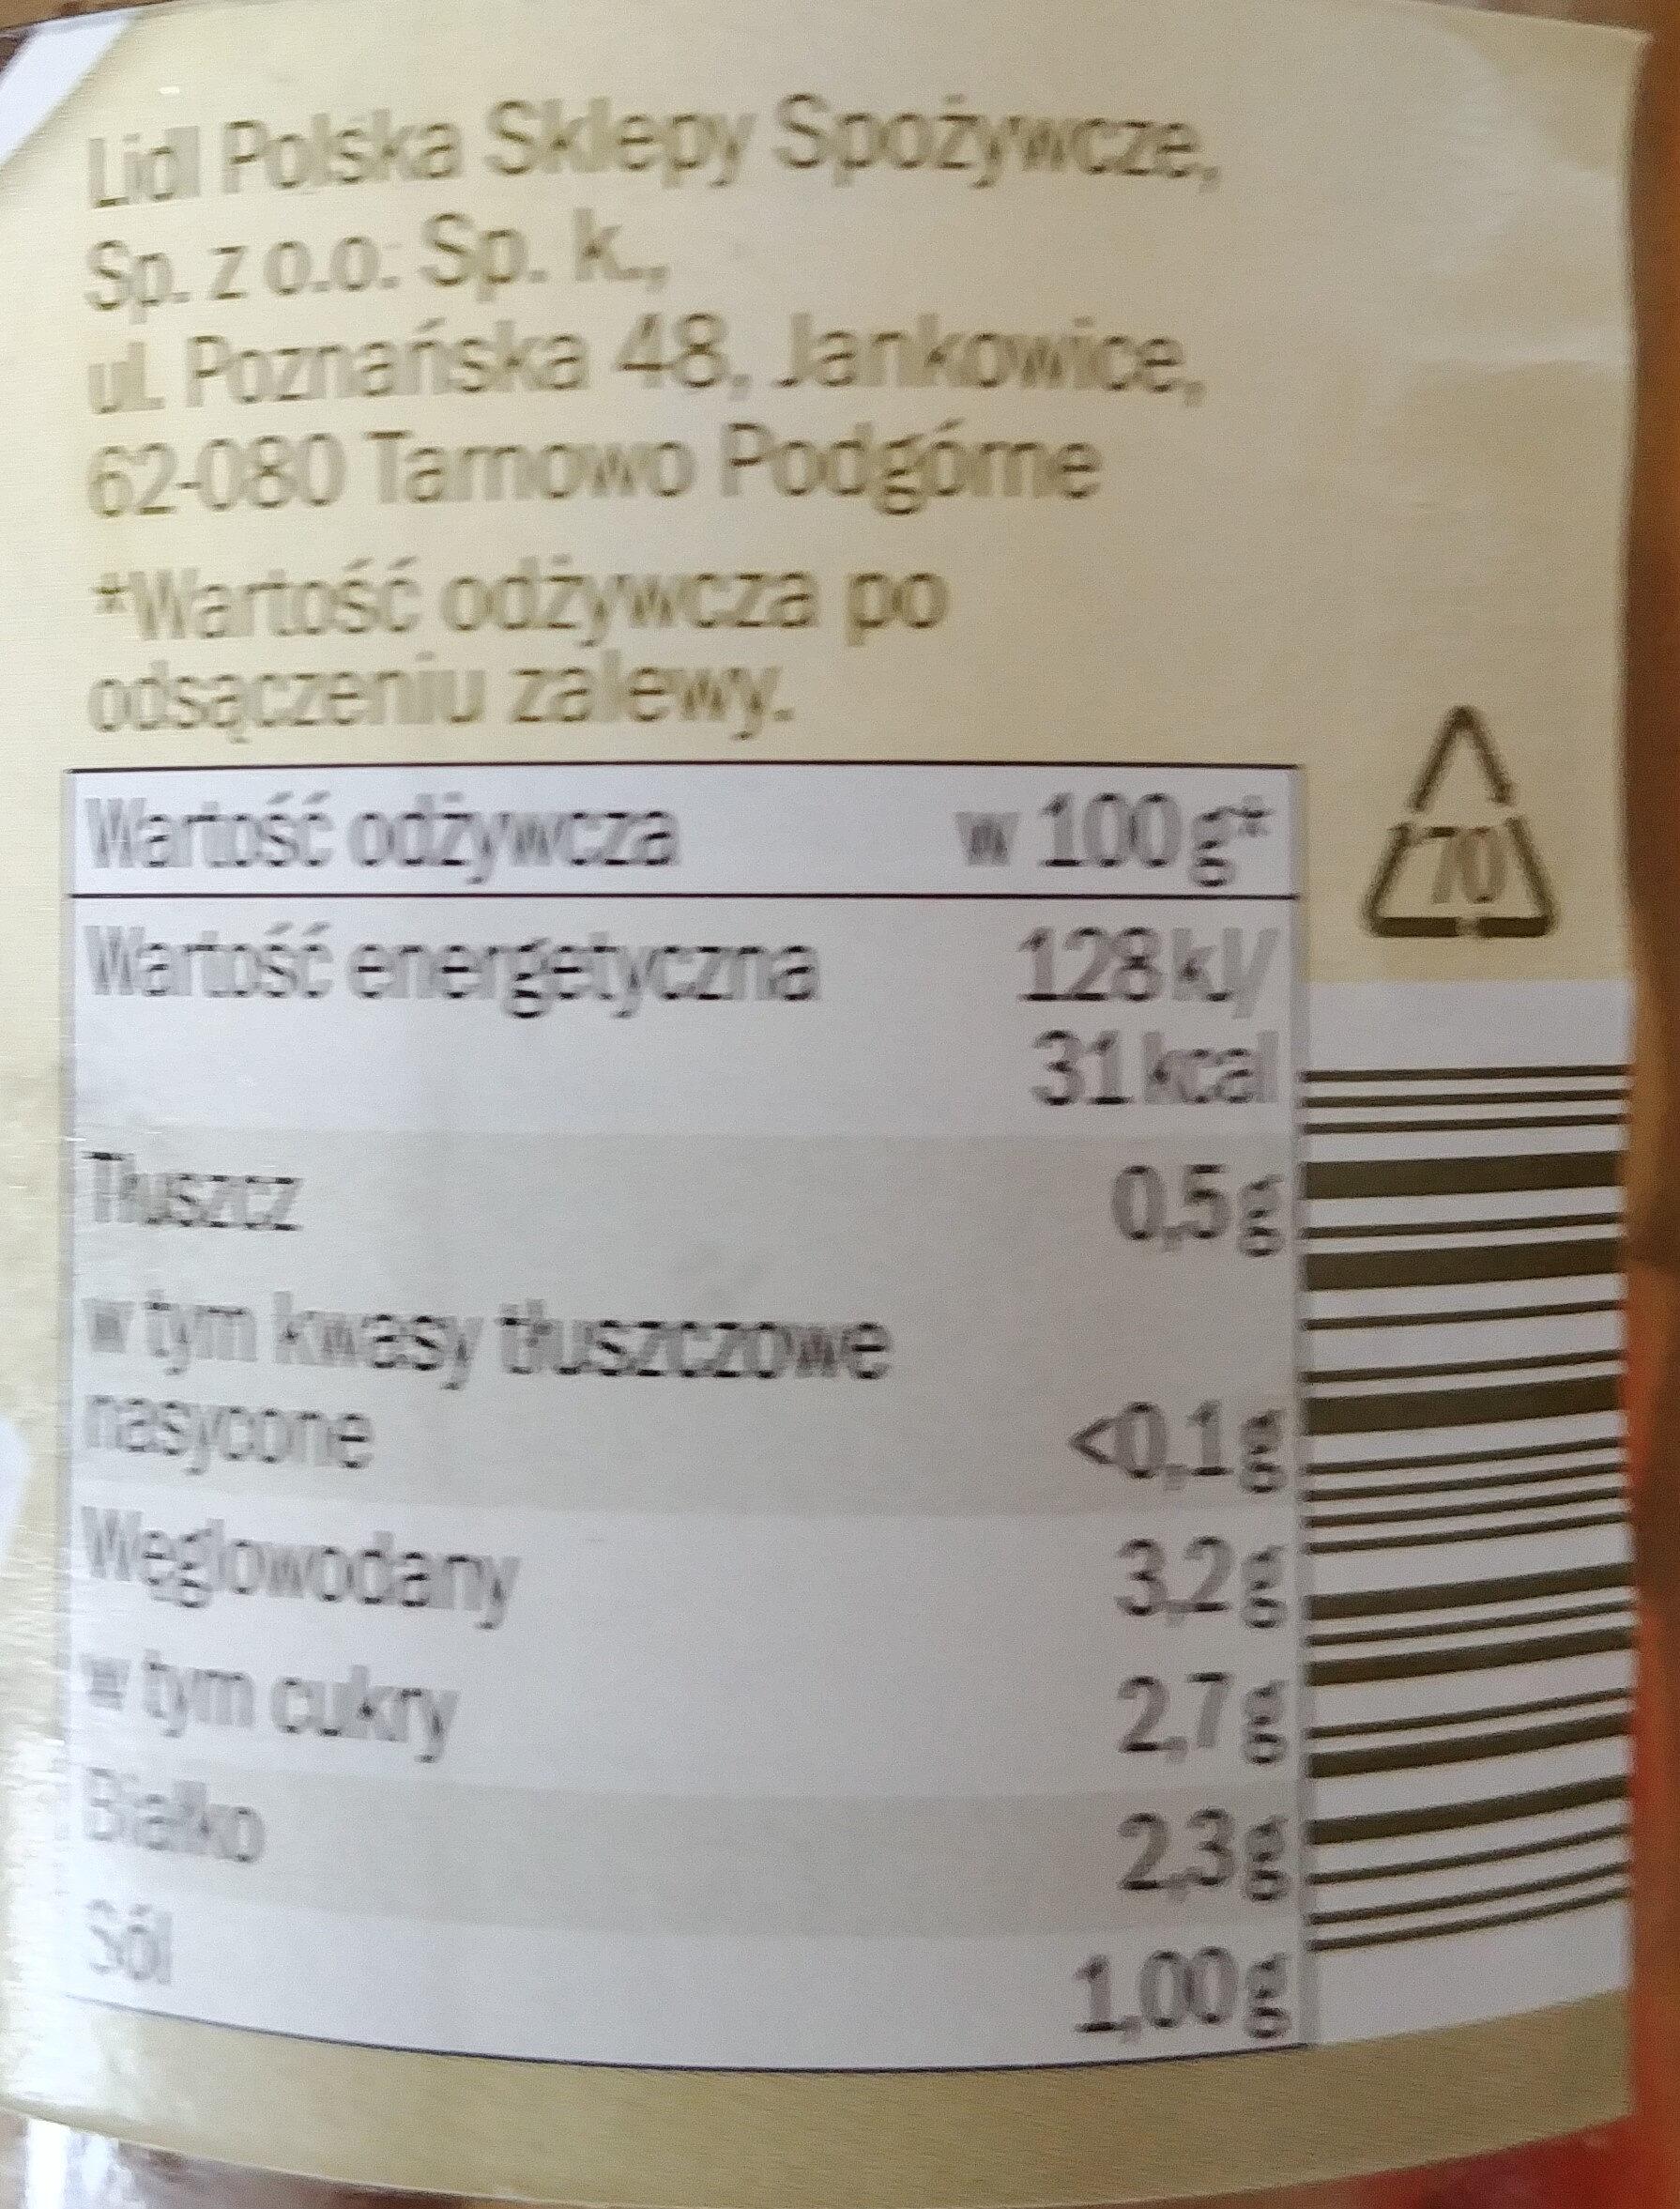 Pieczarki marynowane - Informations nutritionnelles - pl